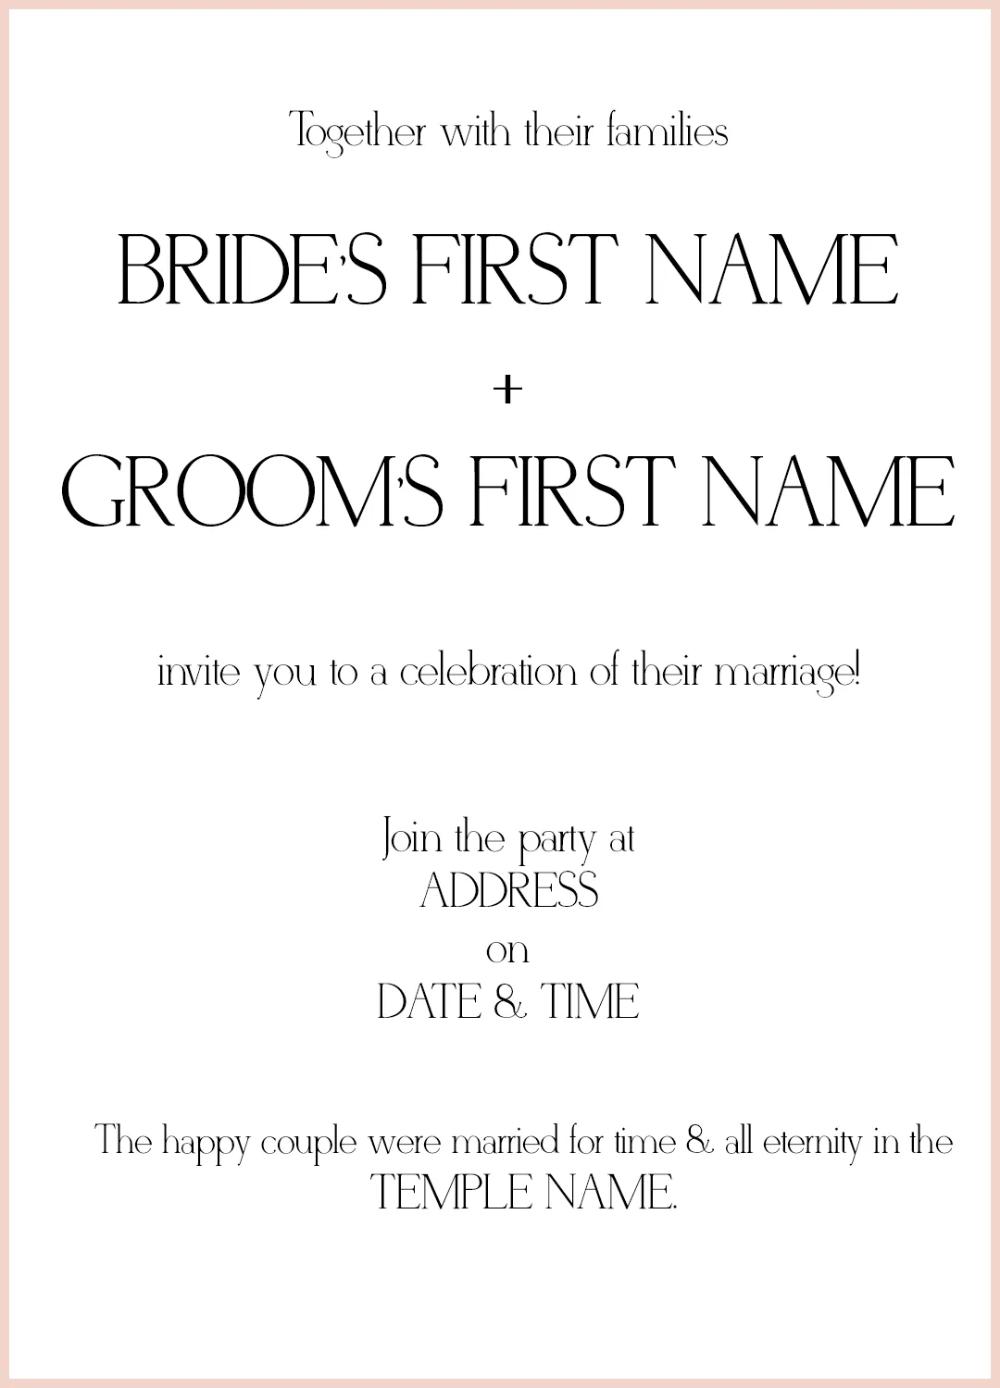 8 Lds Wedding Invitation Wording Samples Lds Wedding In 2020 Wedding Invitation Etiquette Lds Wedding Invitations Wedding Reception Invitation Wording